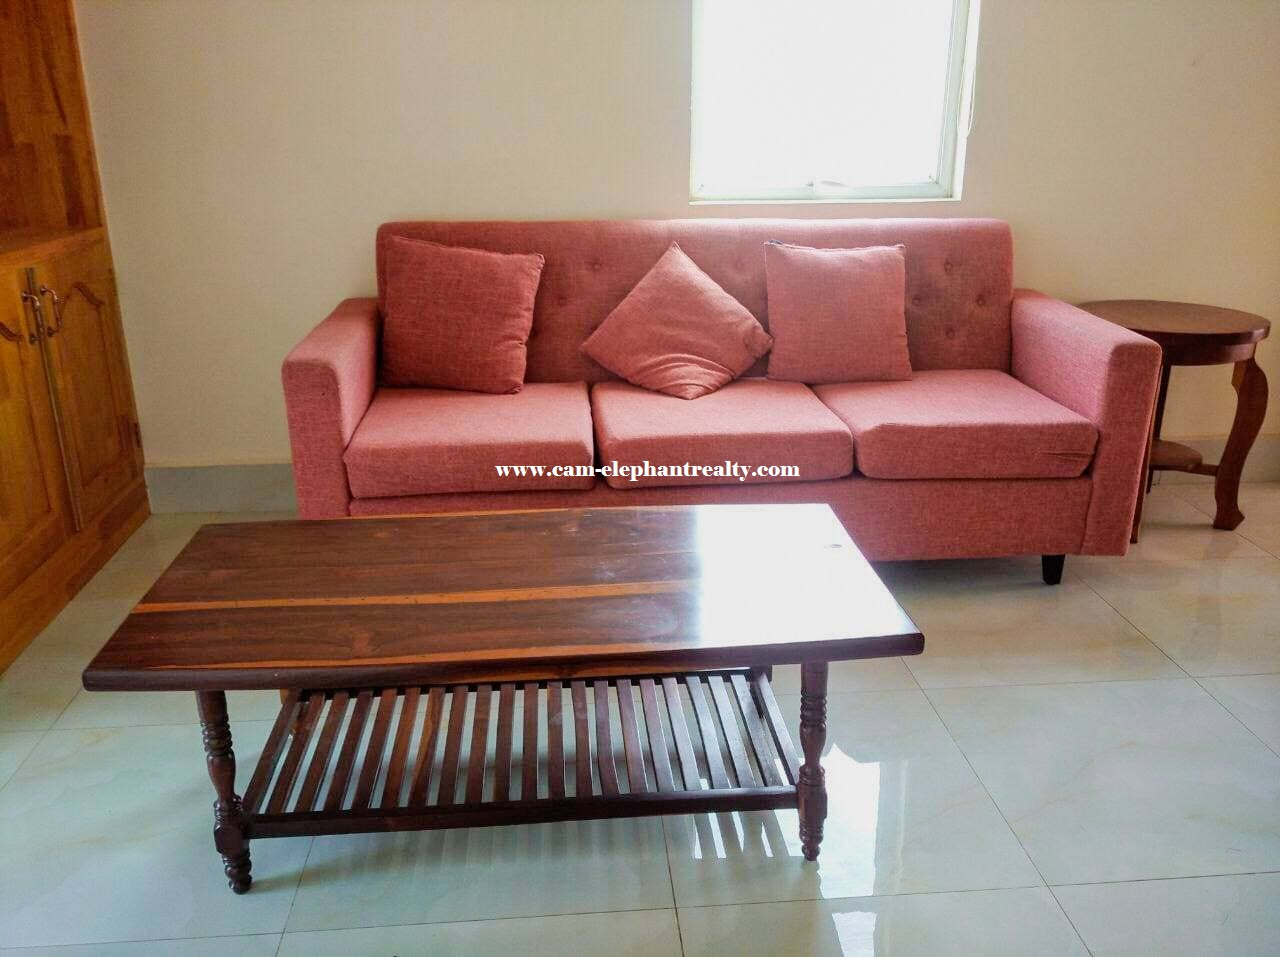 Western Apartment for Rent (1Bedroom: Boeung Trobek)